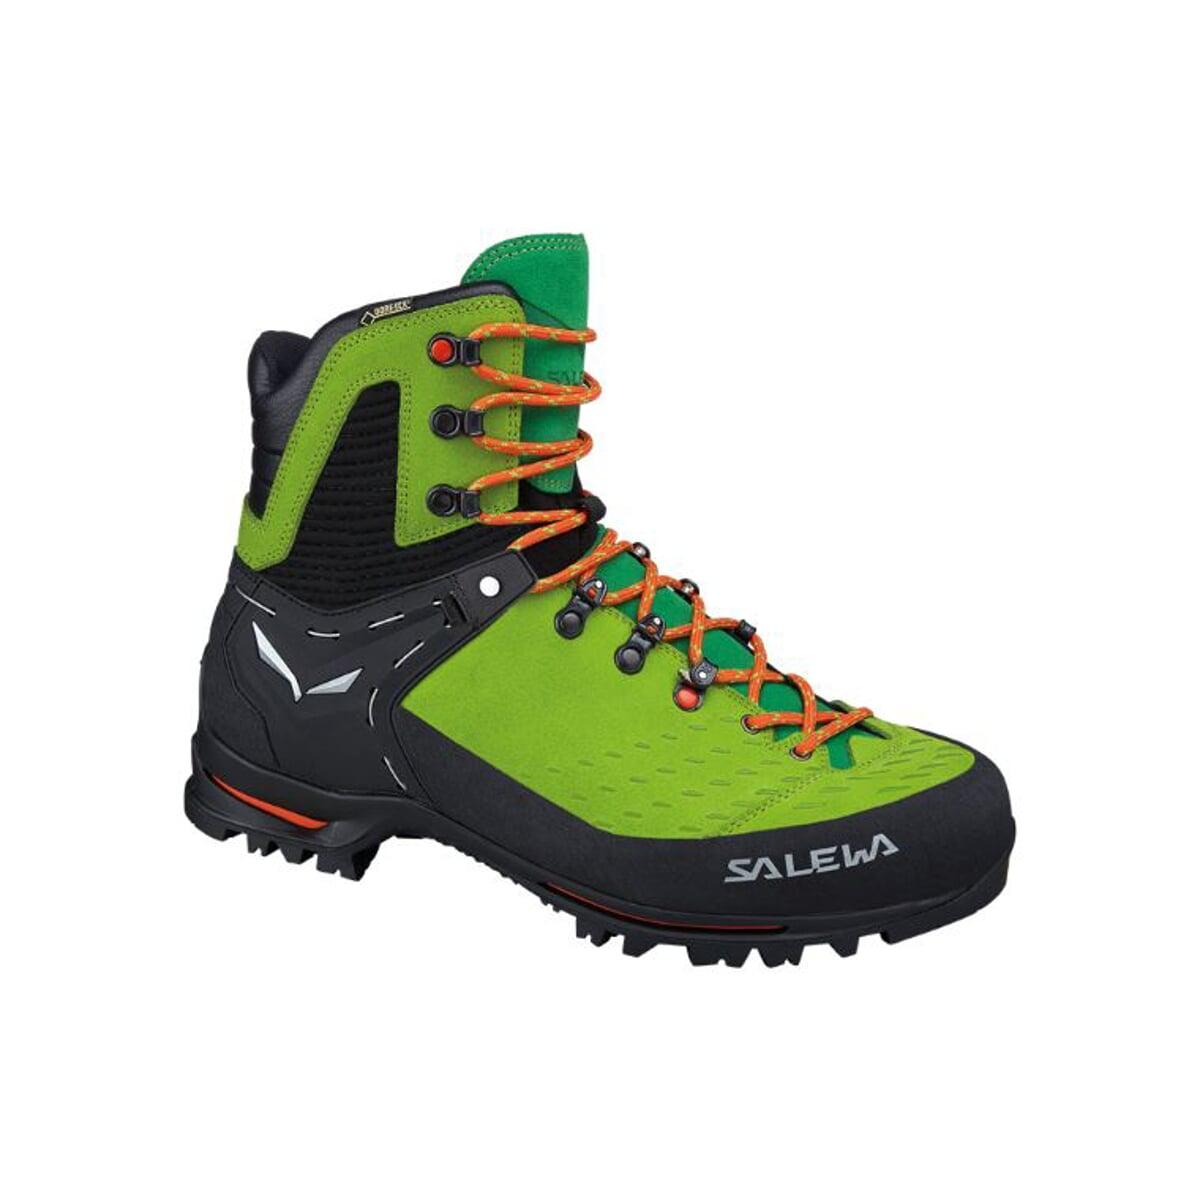 Turistická obuv SALEWA UN VULTUR GTX Cactus Ar  1c928687bf